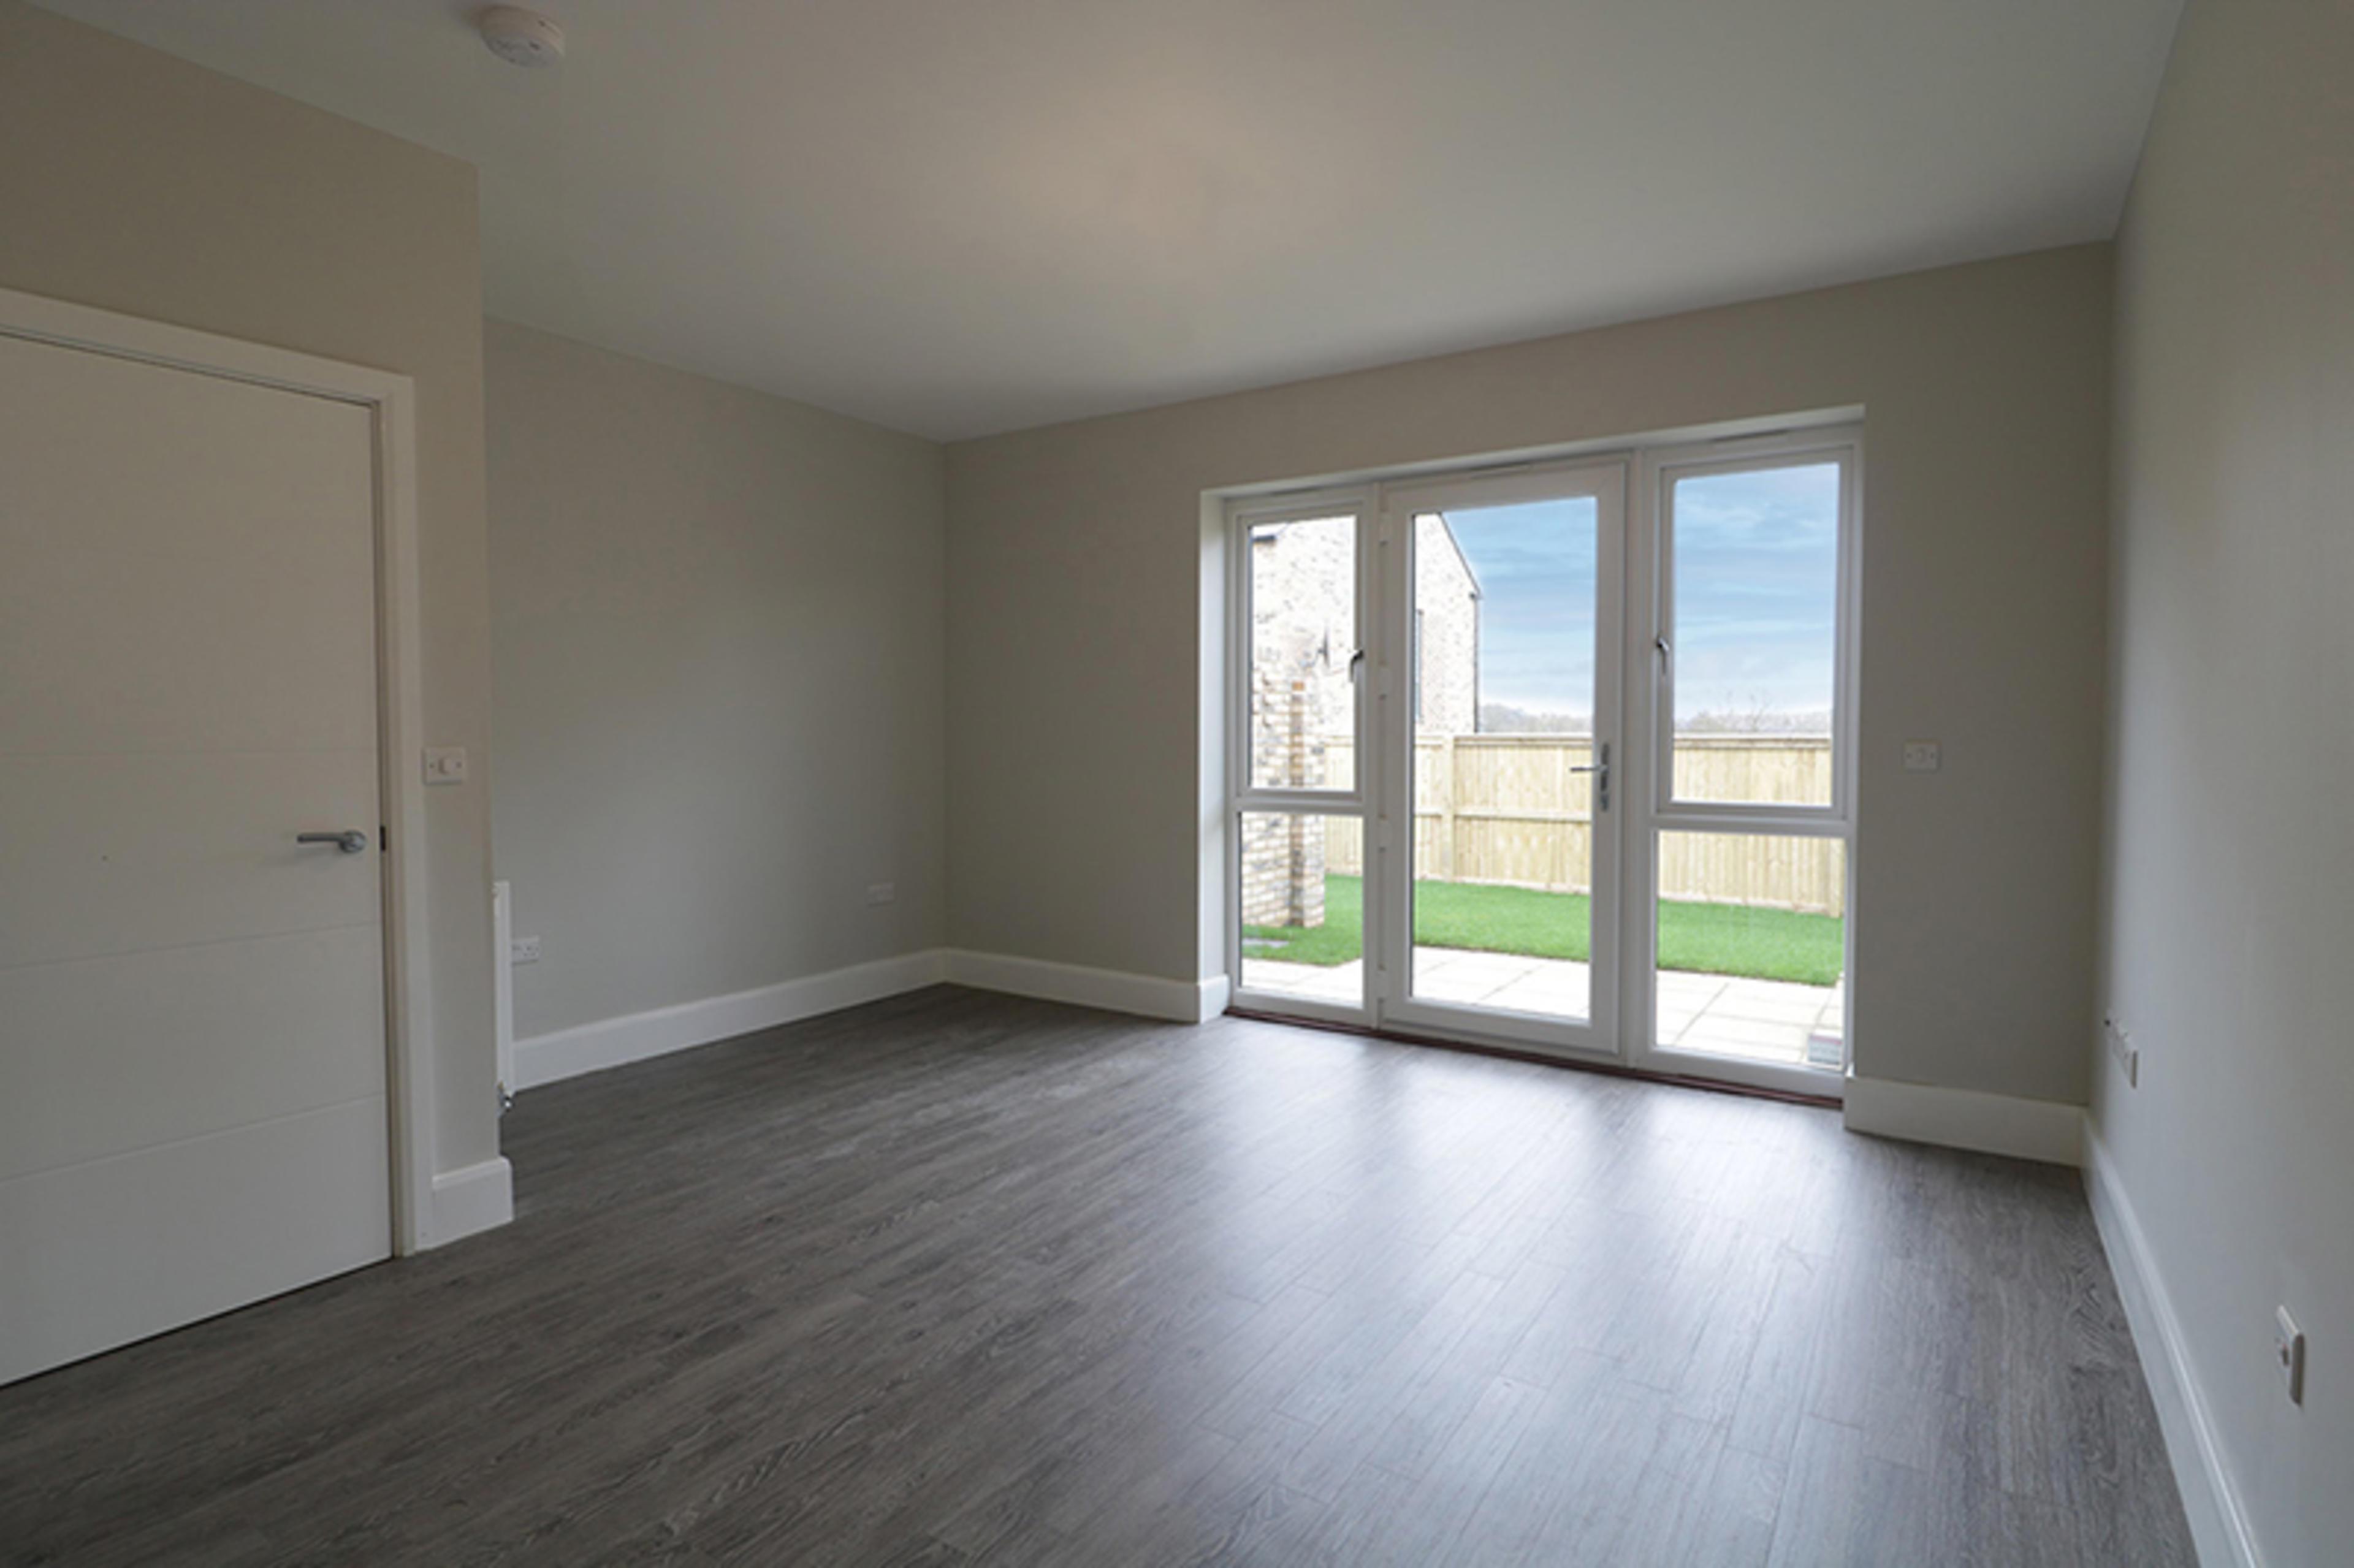 watling-grange-harrogate-friar-2-bed-home-living-room-1